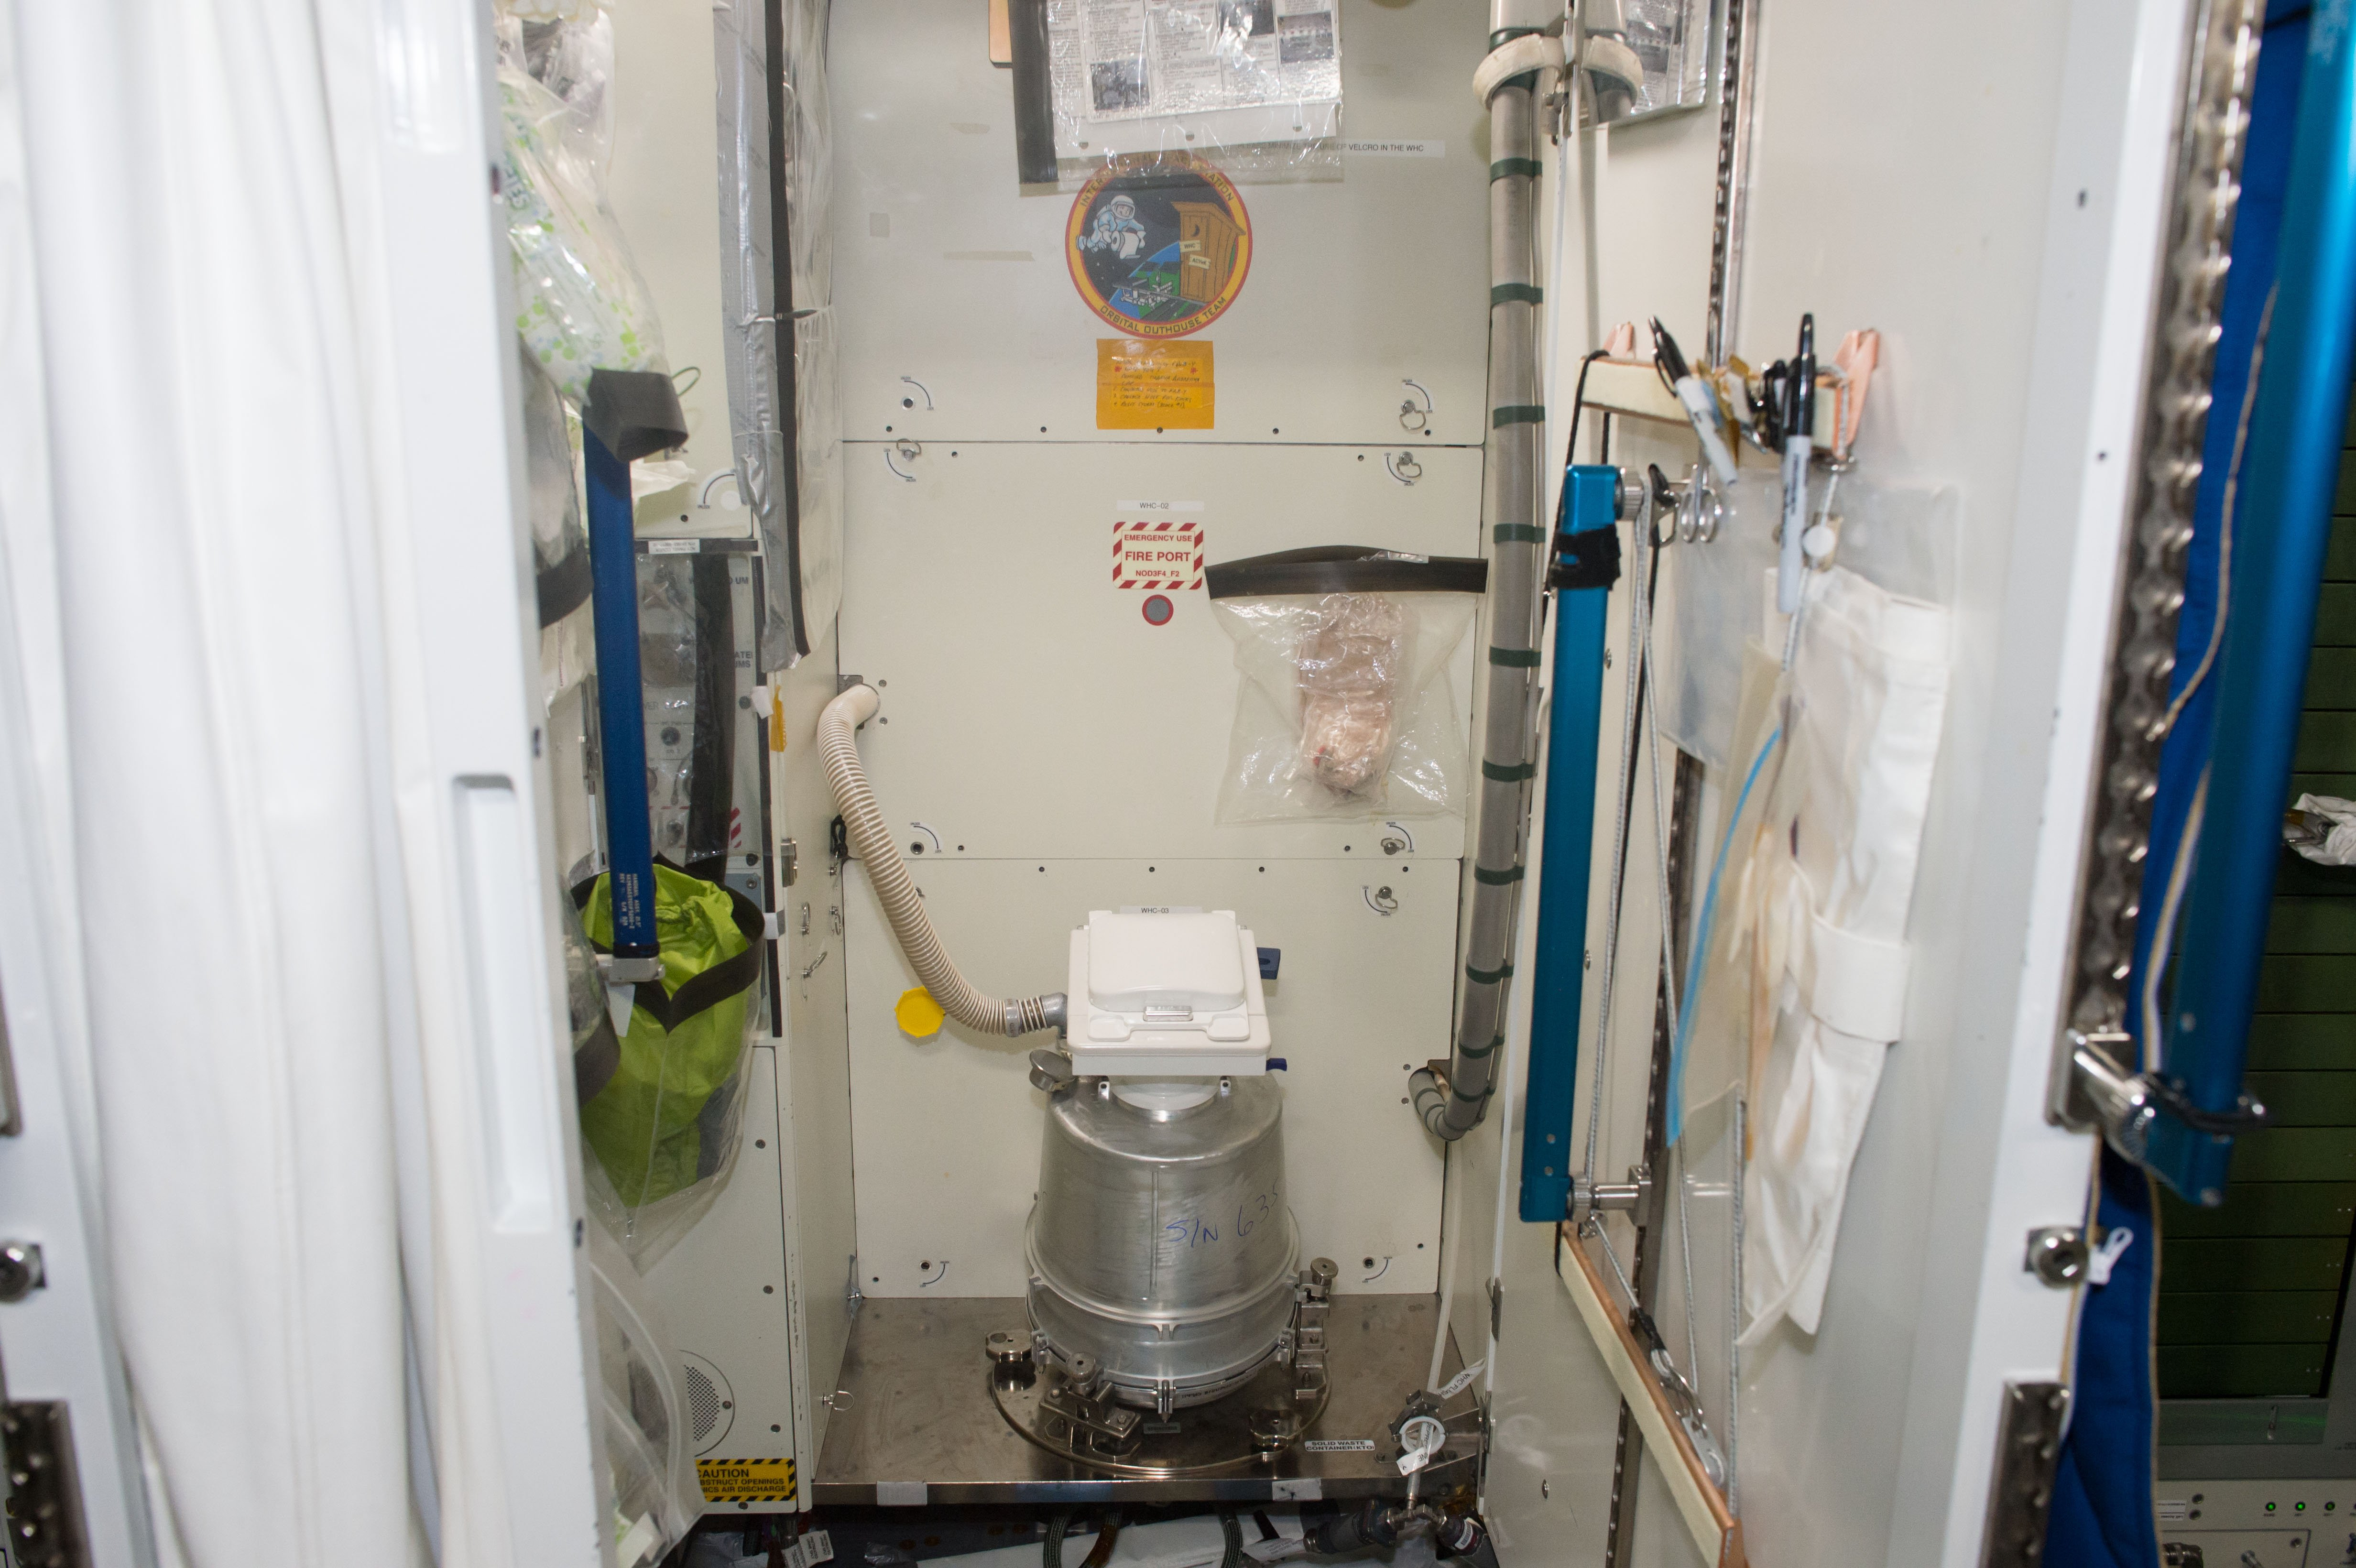 Space toilet1